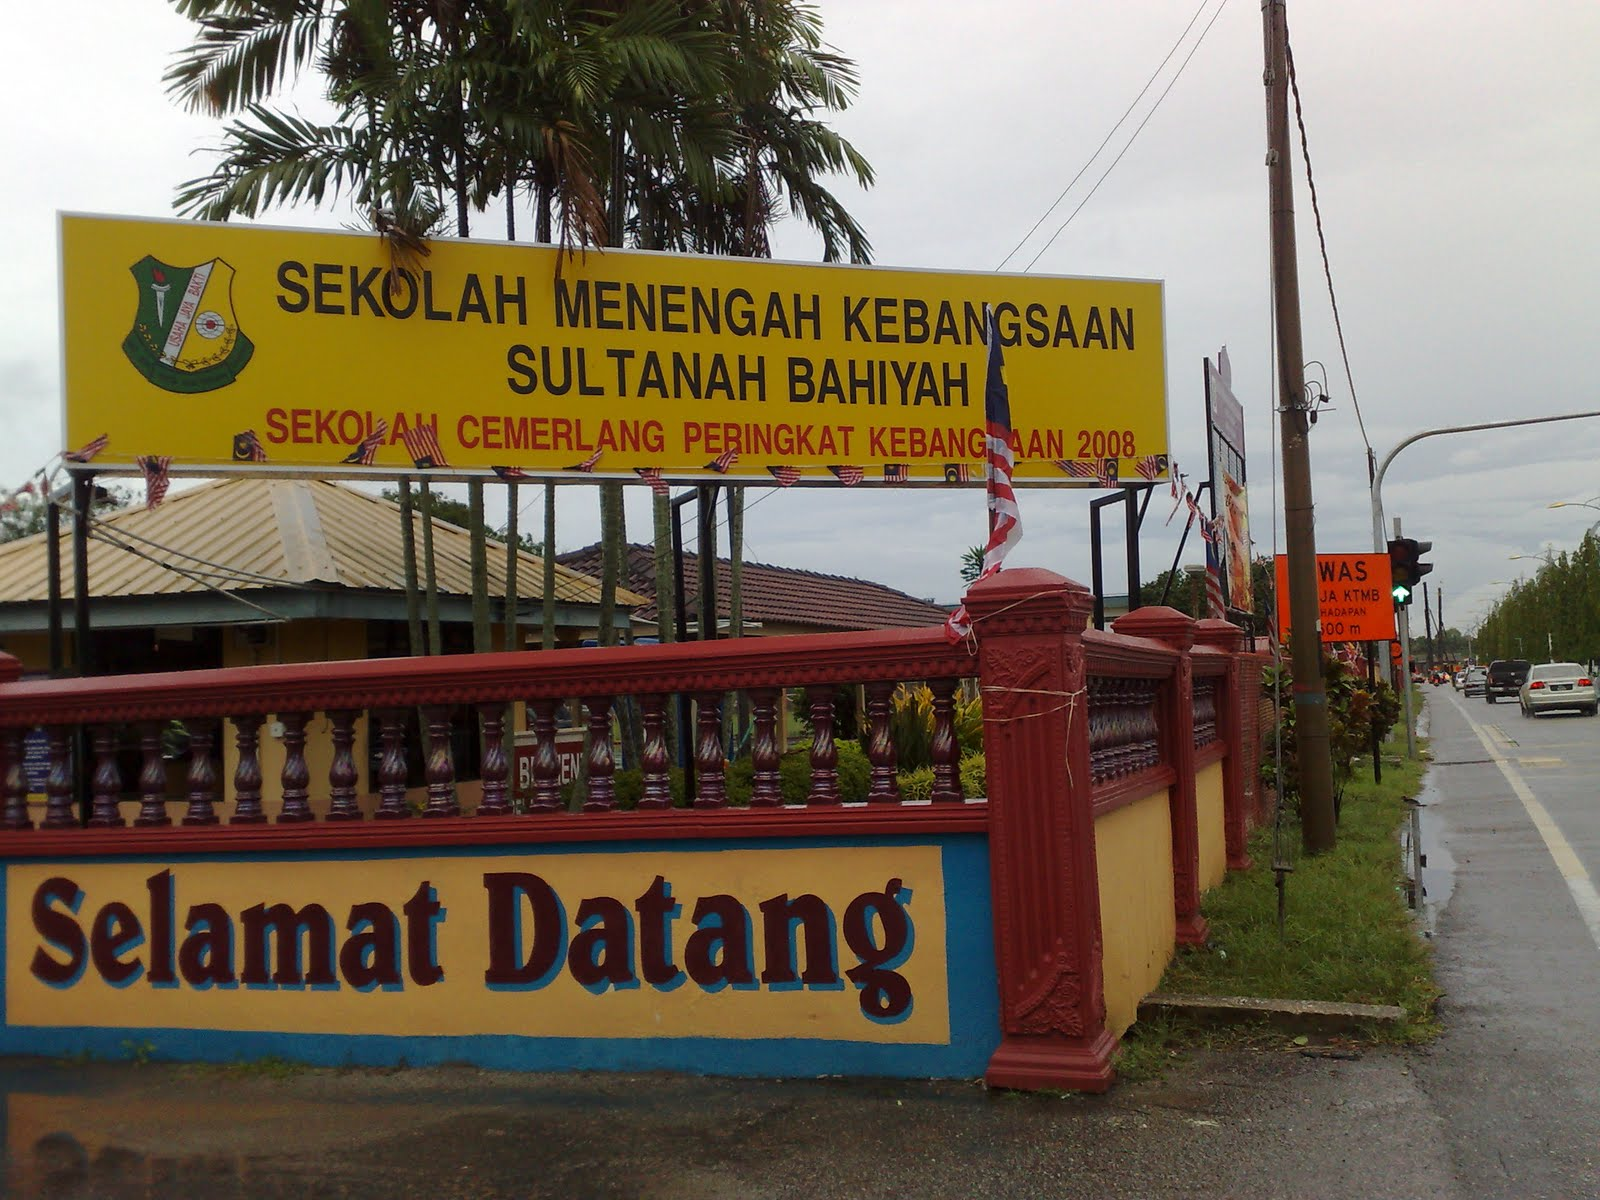 Image result for Sekolah Menengah Kebangsaan Sultanah Bahiyah